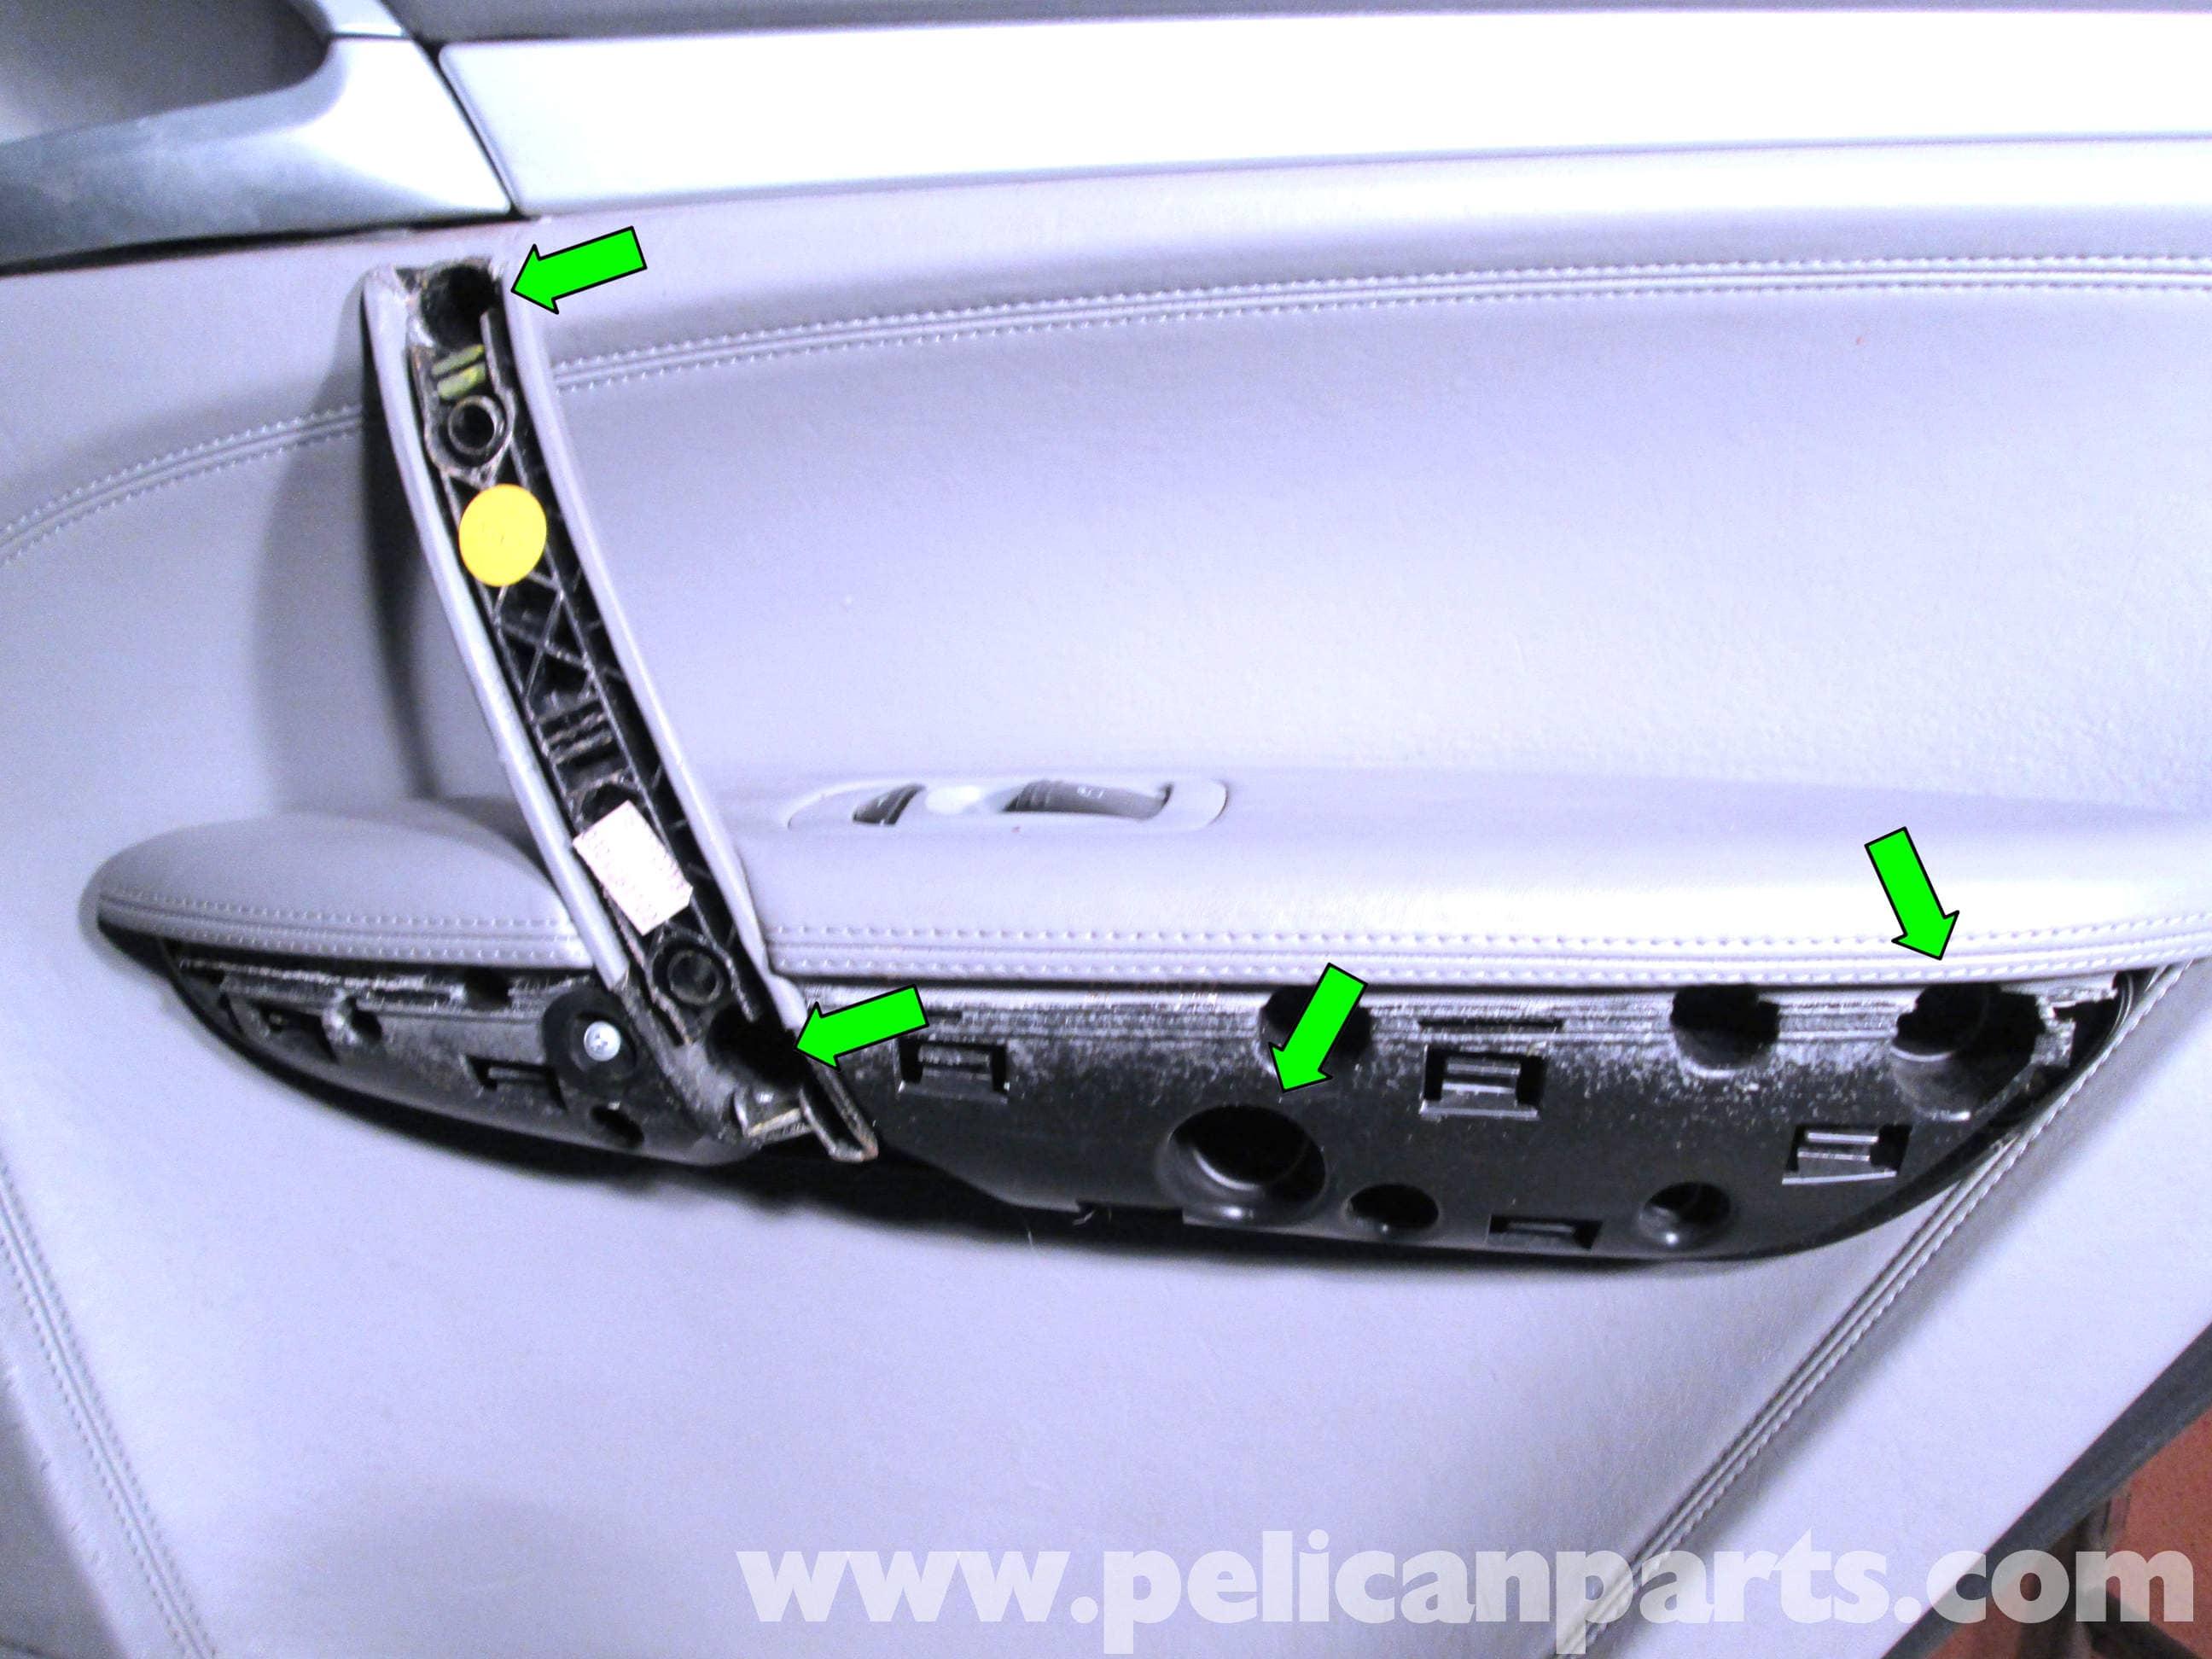 Porsche Cayenne Rear Door Panel Removal | 2003-2008 | Pelican Parts ...